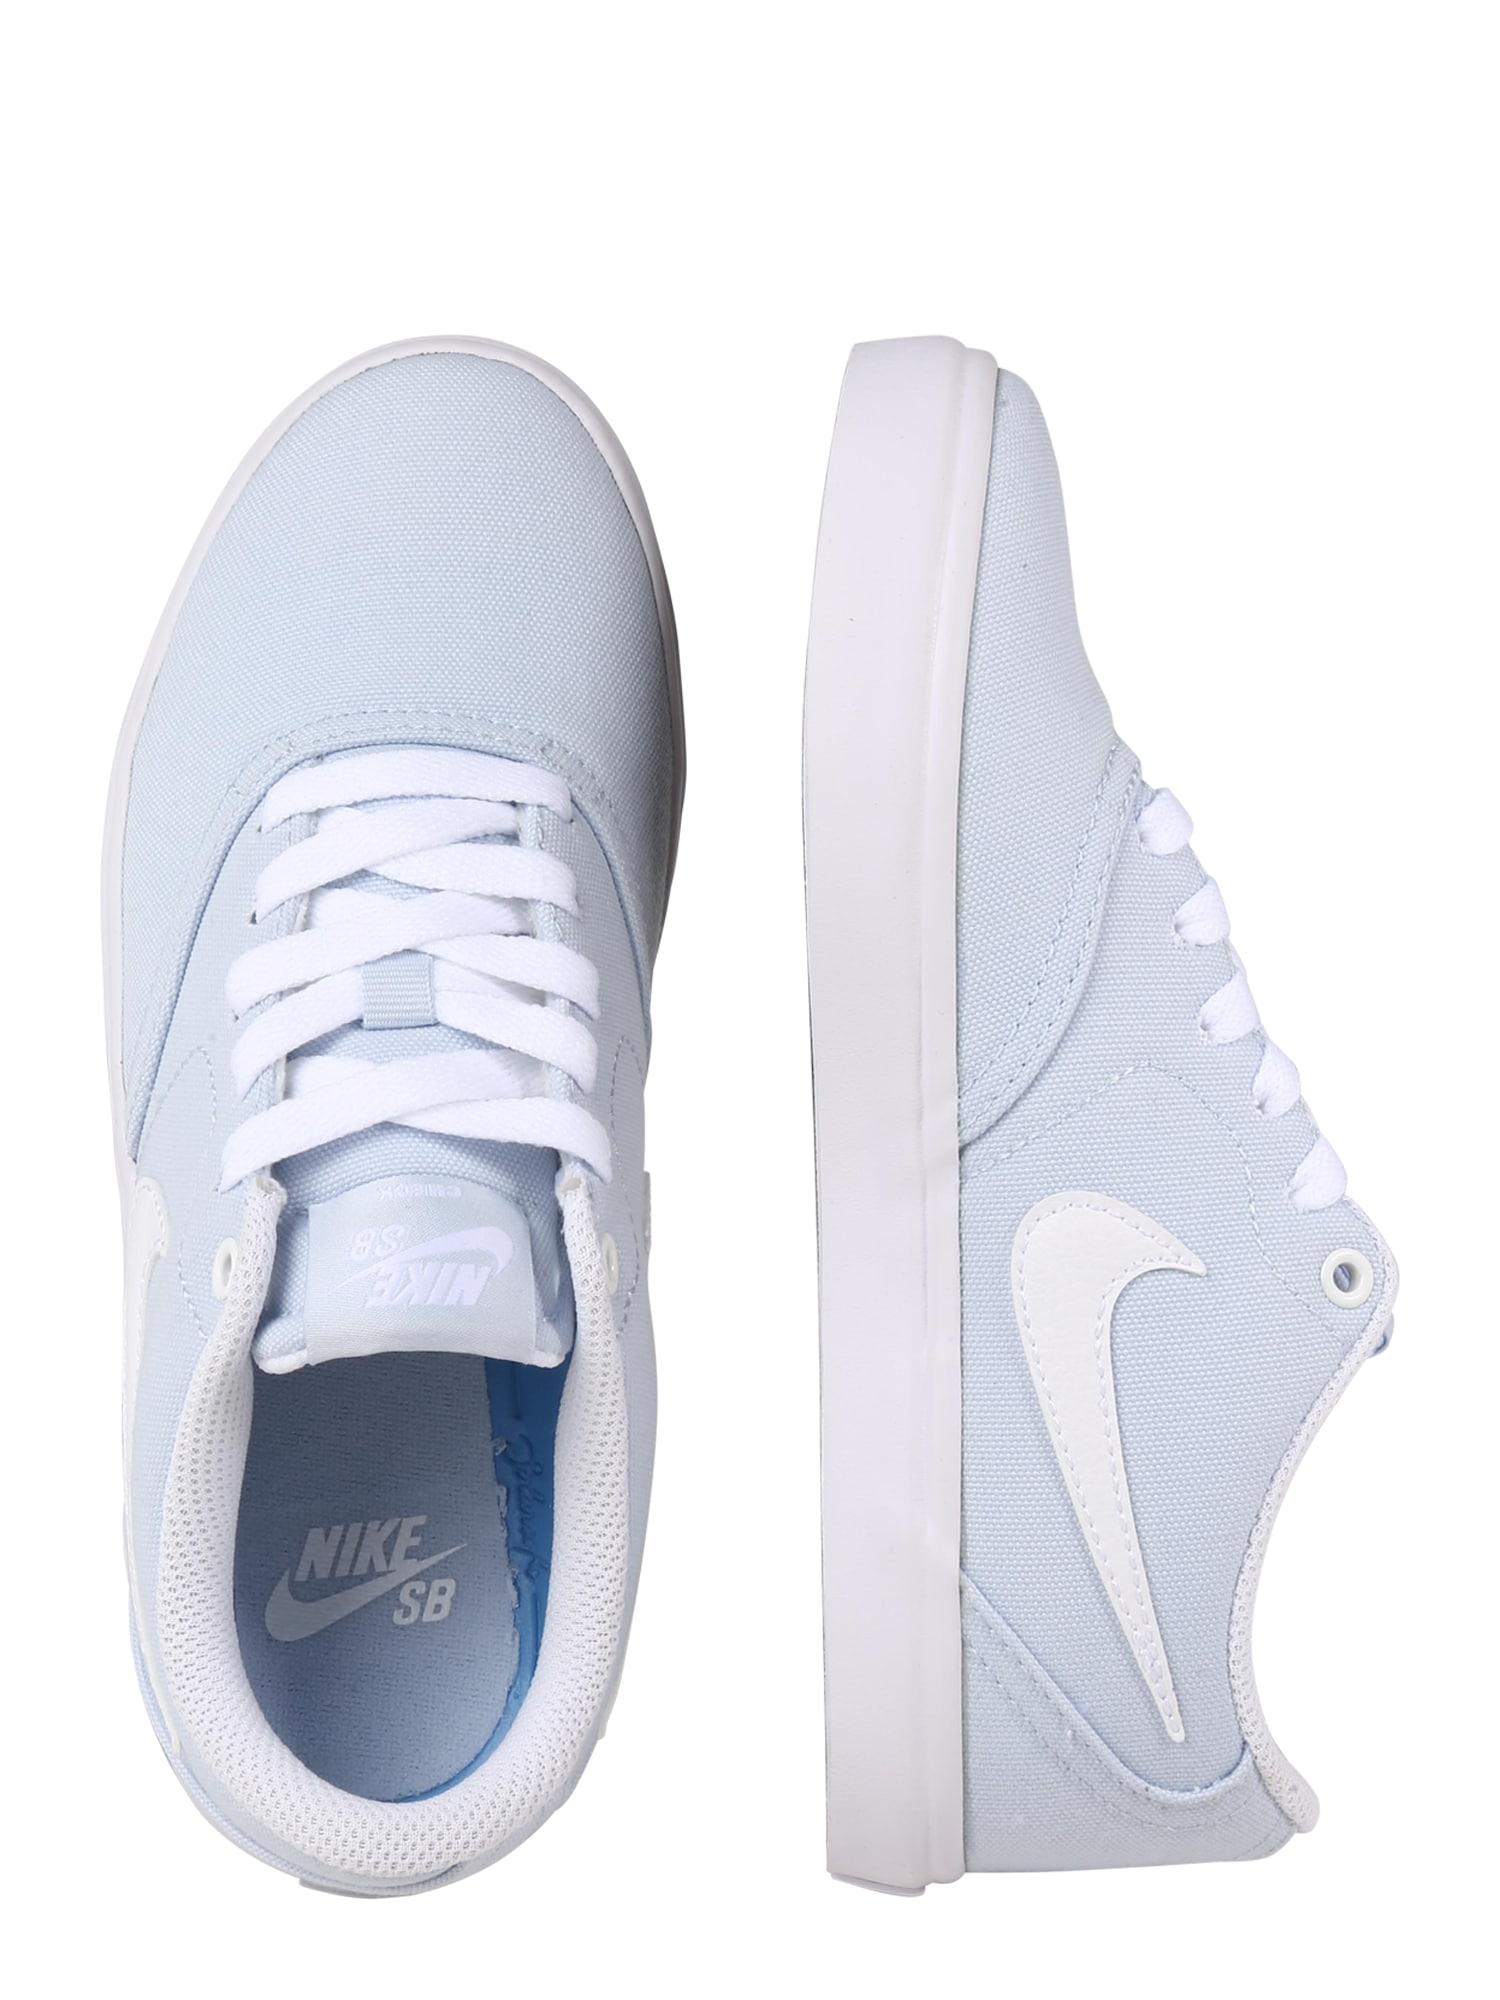 Nike SB, Damen Sportschoen Solarsoft Canvas, blauw / wit